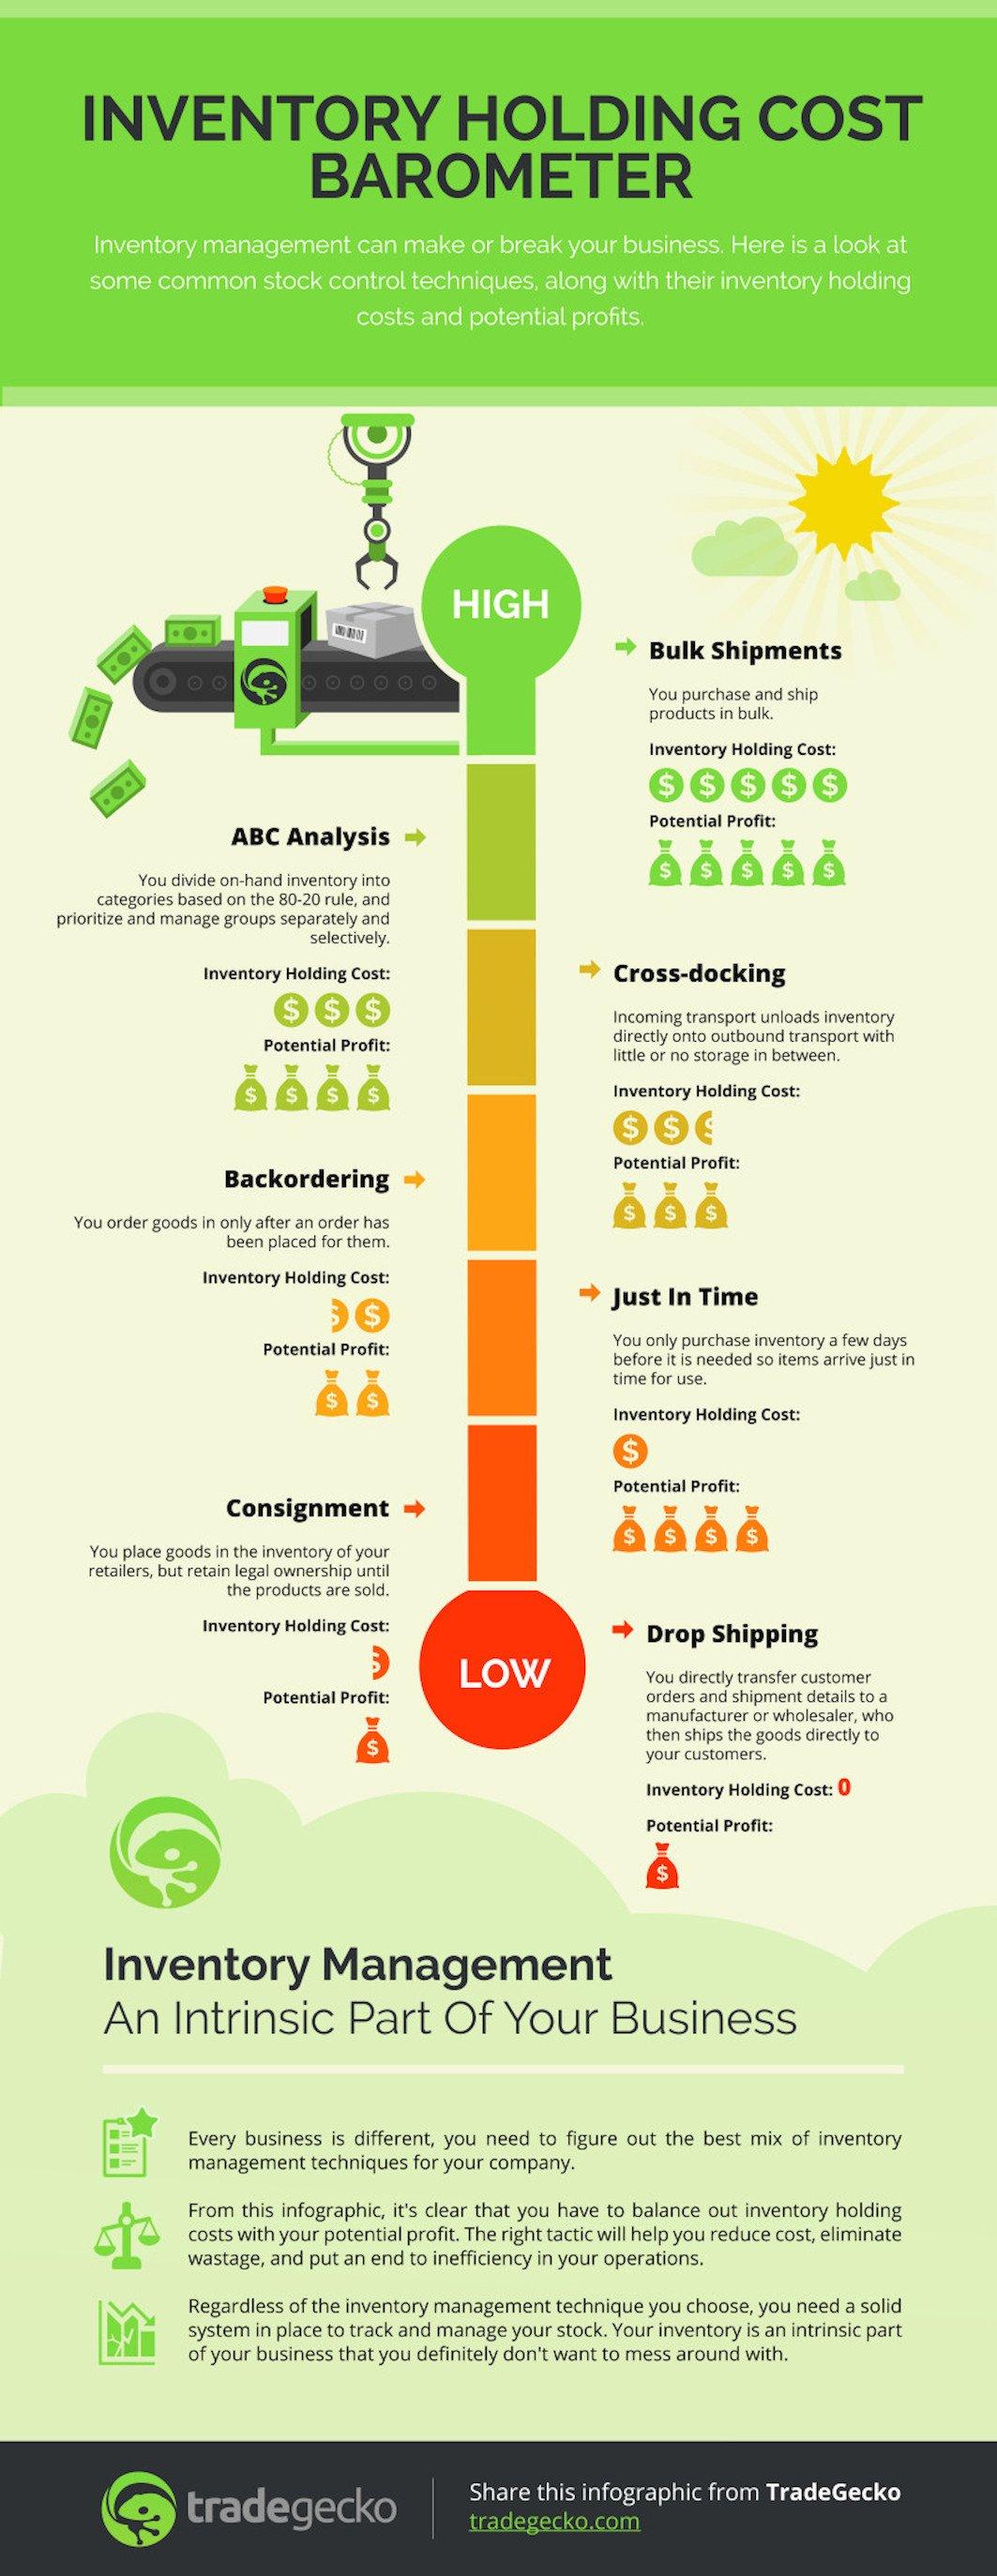 Tradegeko_infographic_24-07-14